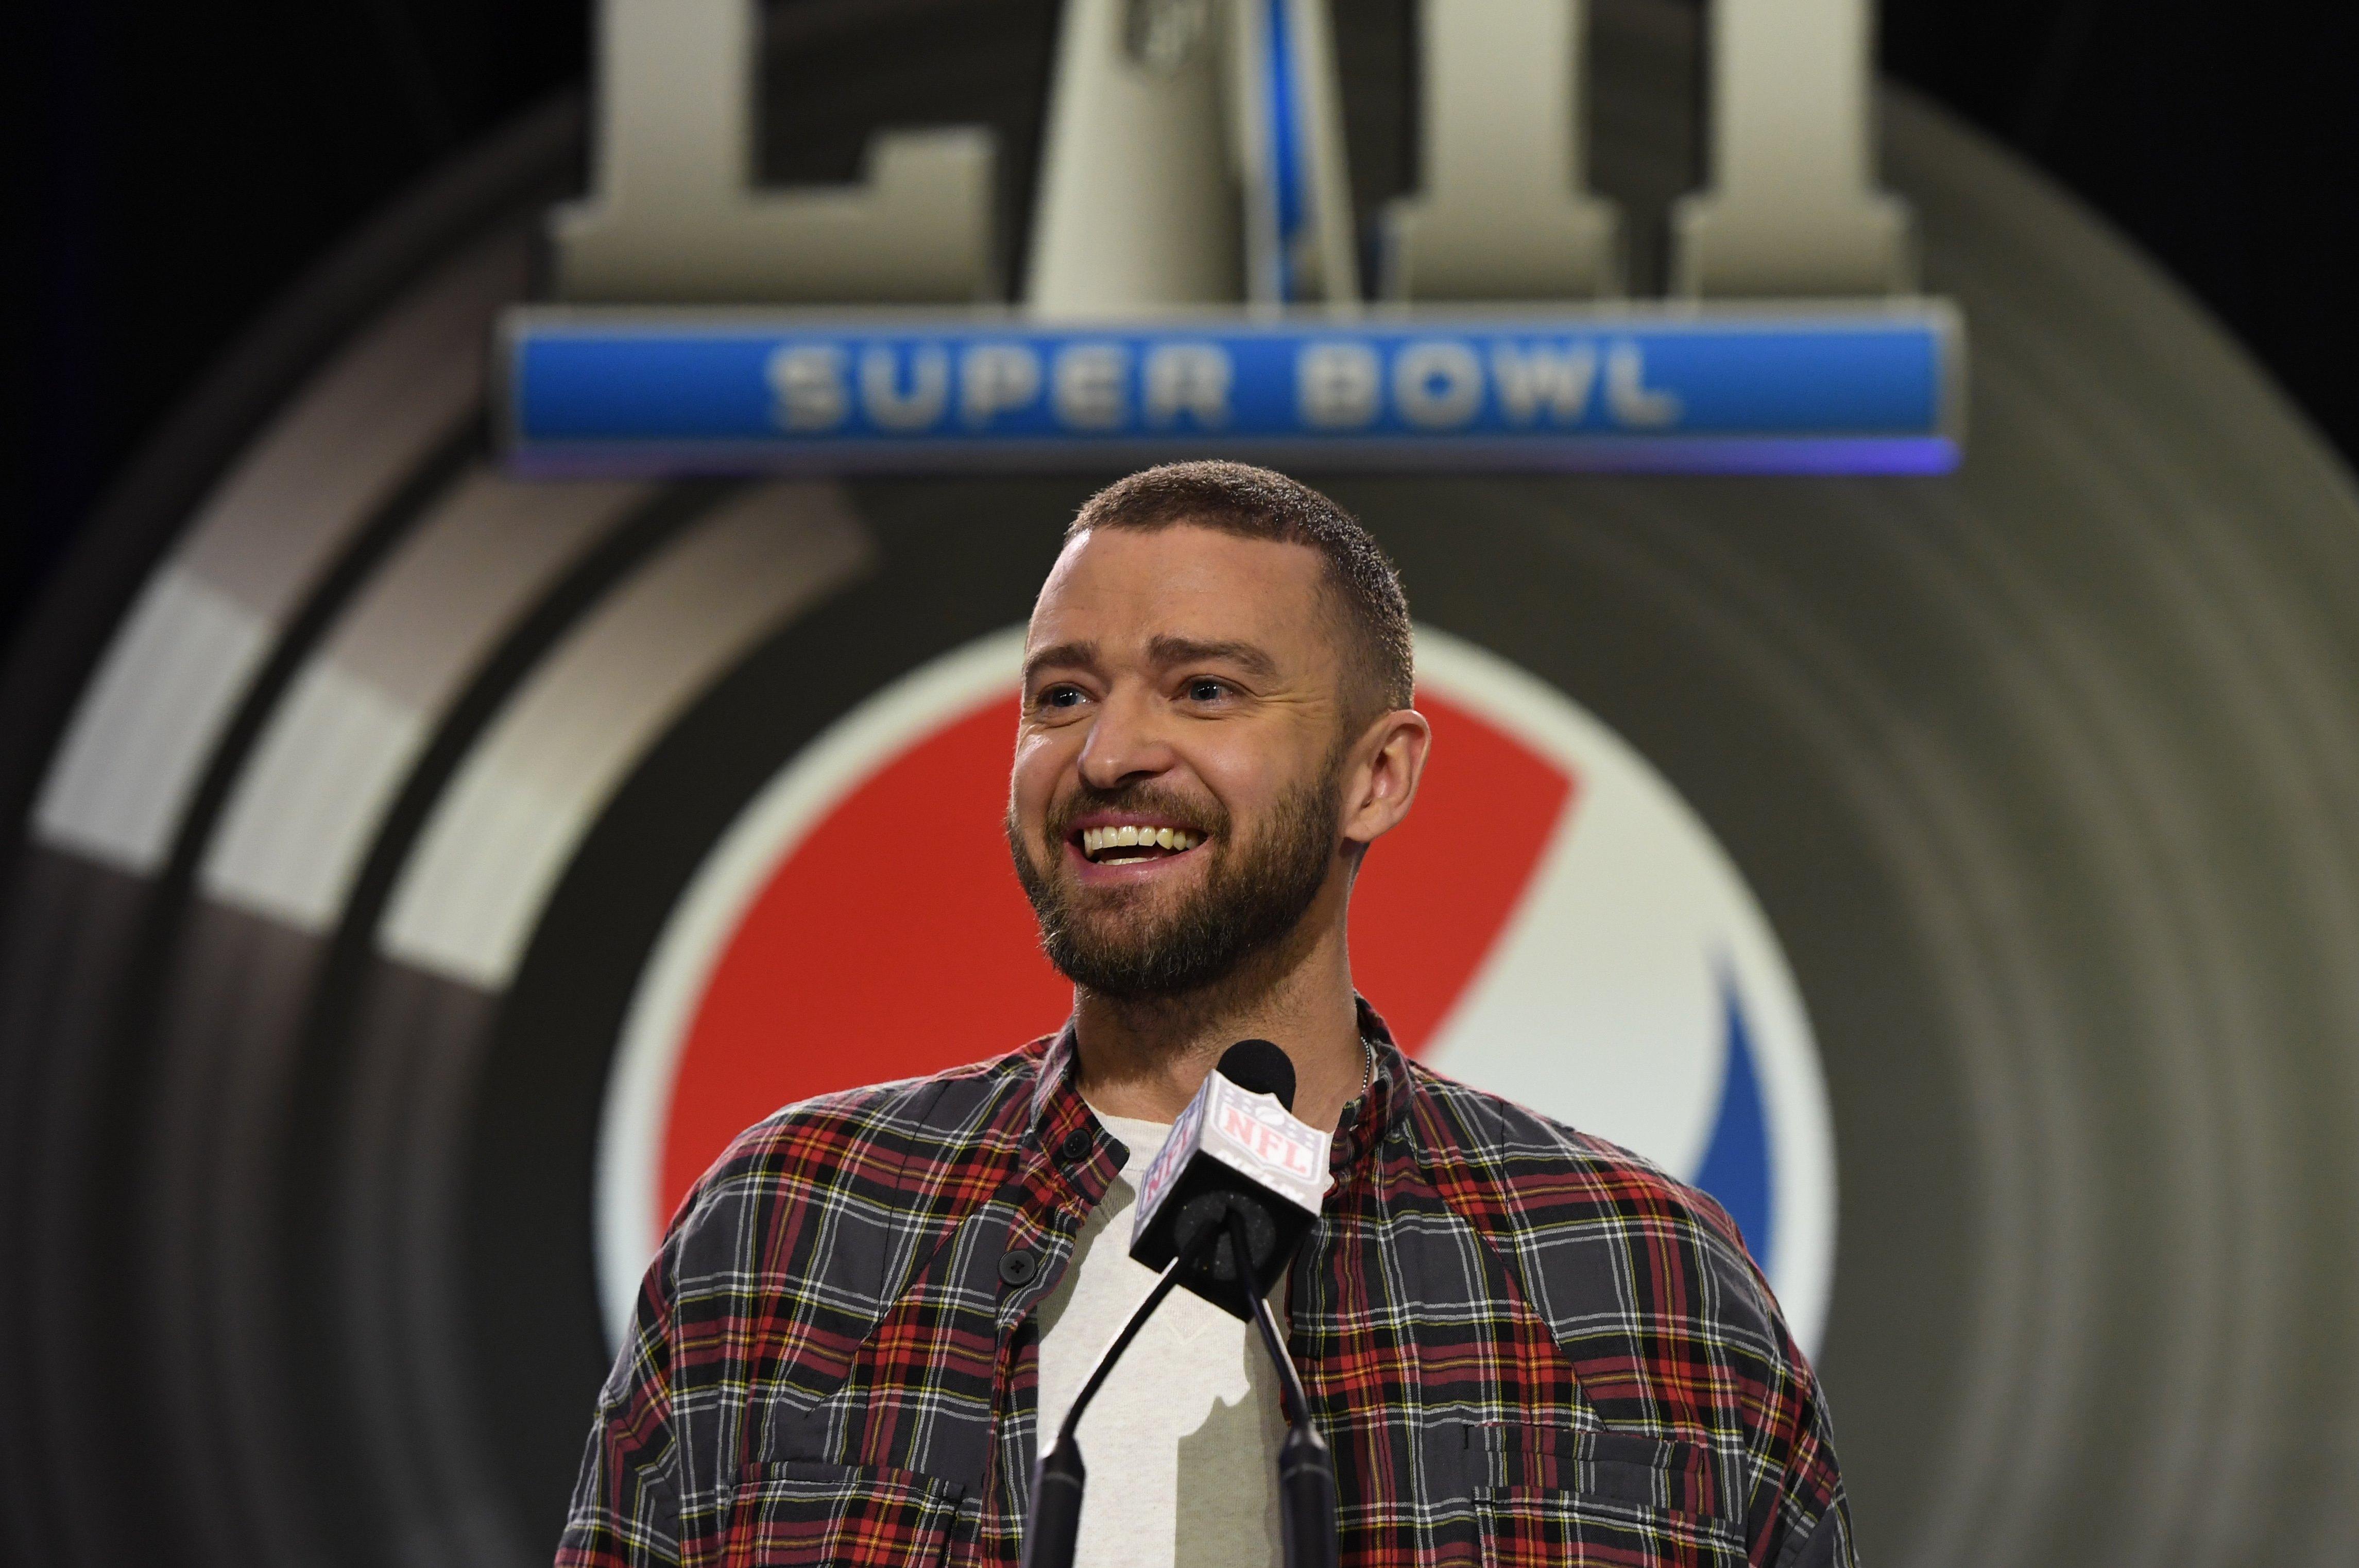 bb6b34df3b7 Super Bowl LII: Justin Timberlake on halftime show plans,